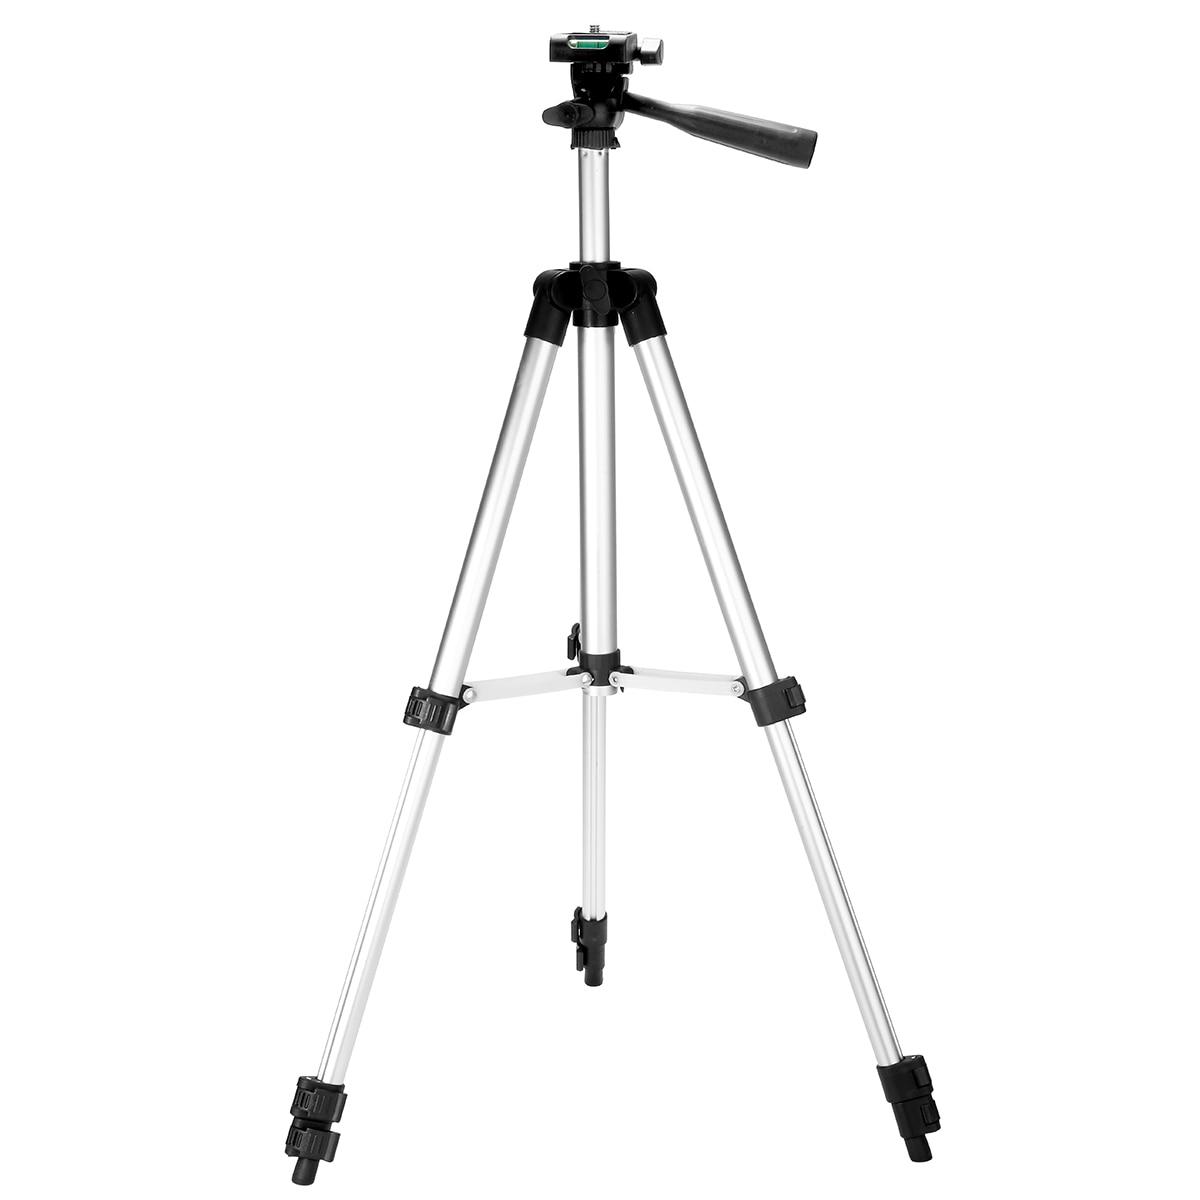 Pohiks 35cm-102cm Portable Extendable Tripod Aluminium Alloy Stand Adjustable For Mini Projector DLP Camera